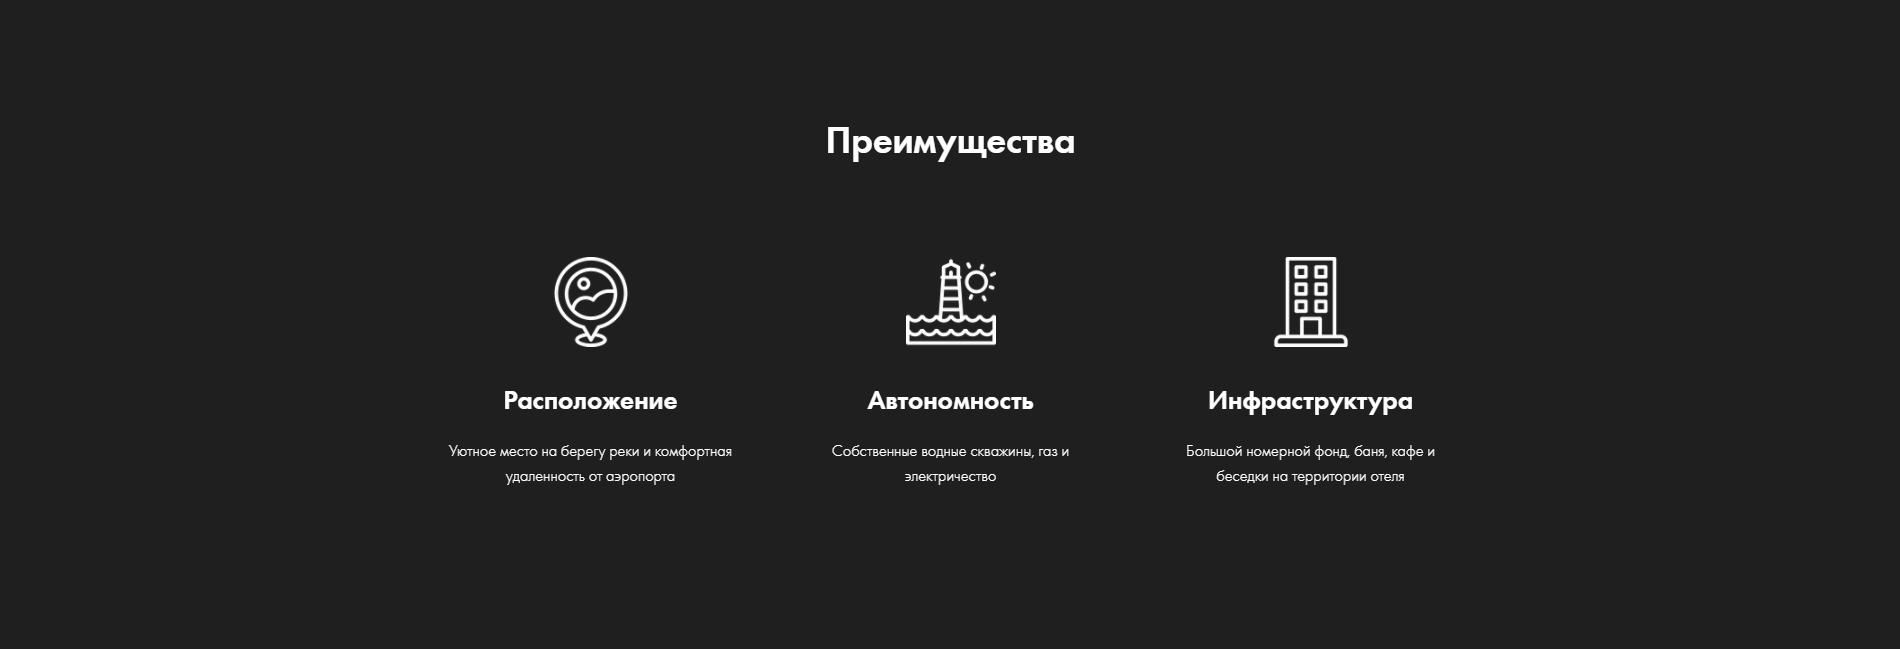 Эко-Отель Алтын-Ай